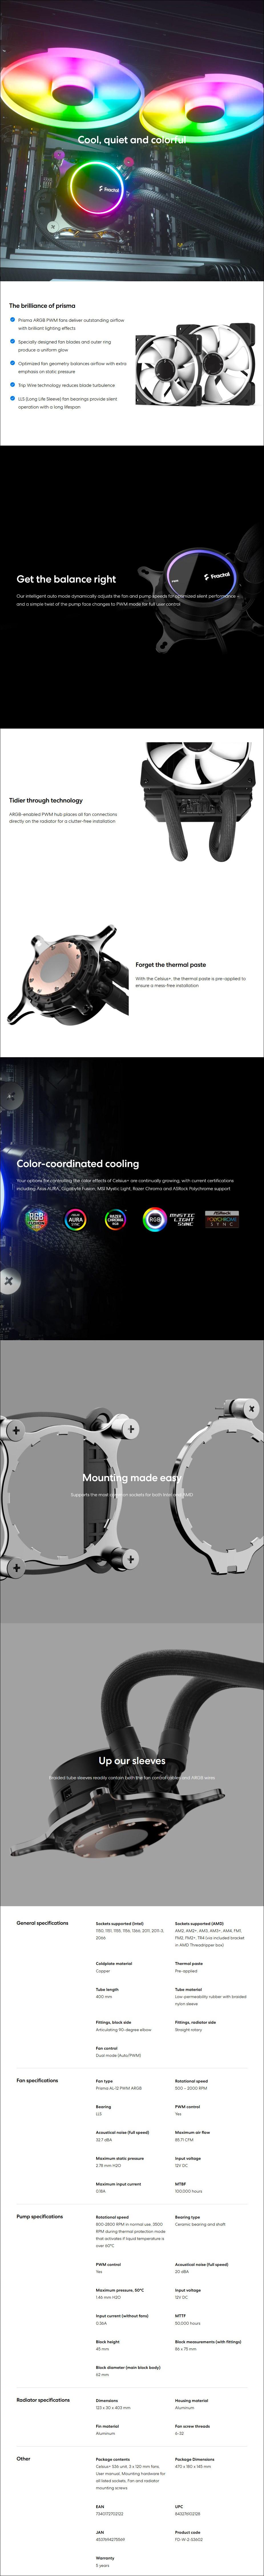 Fractal Design Celsius+ S36 Prisma Liquid CPU Cooler - Overview 1